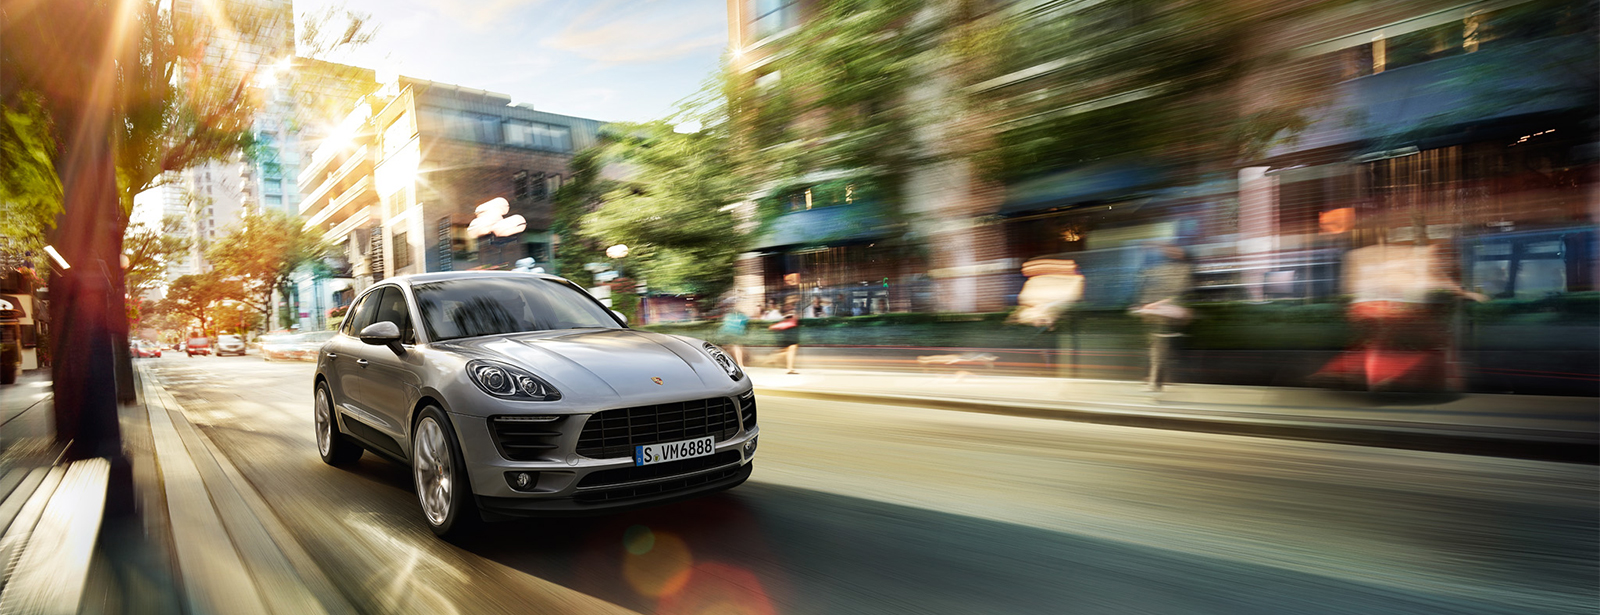 Leasing | Porsche Macan